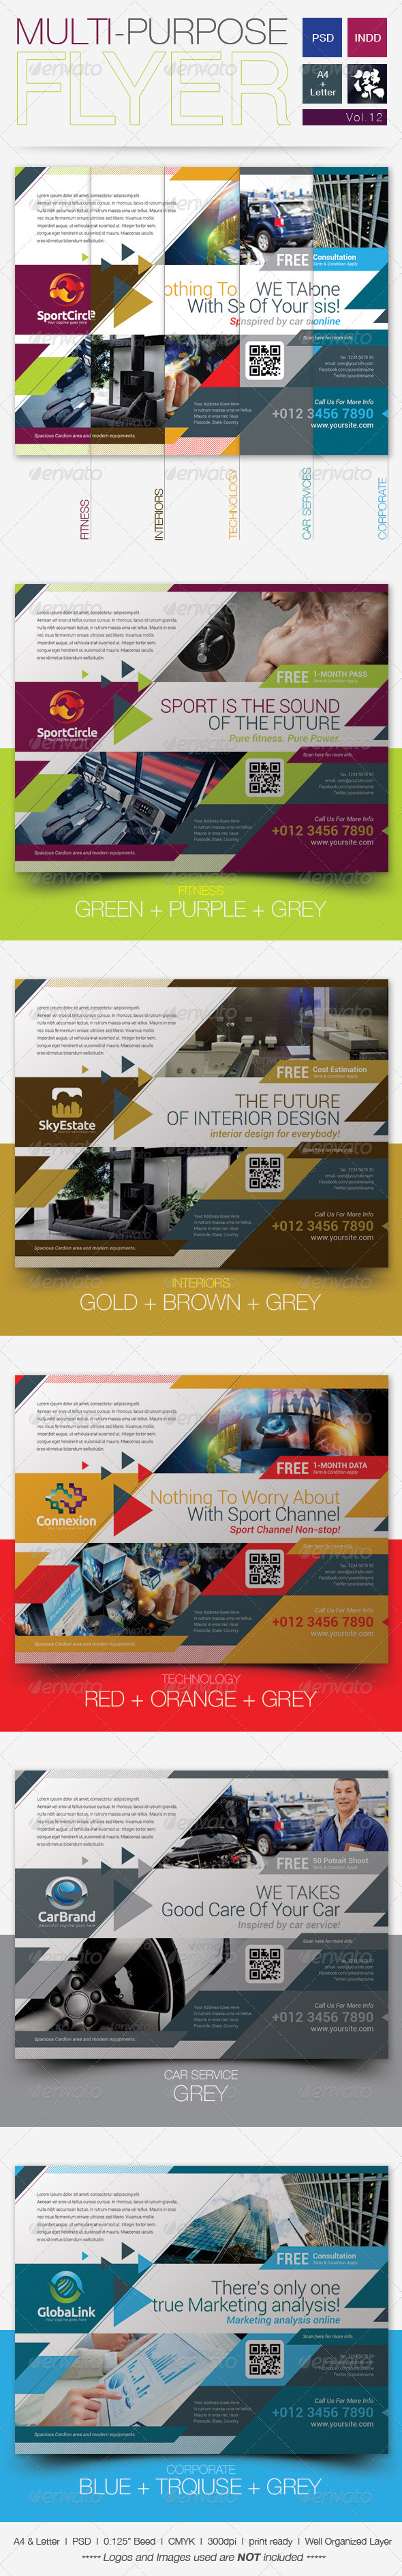 GraphicRiver Multipurpose Business Flyer Vol.12 5456887